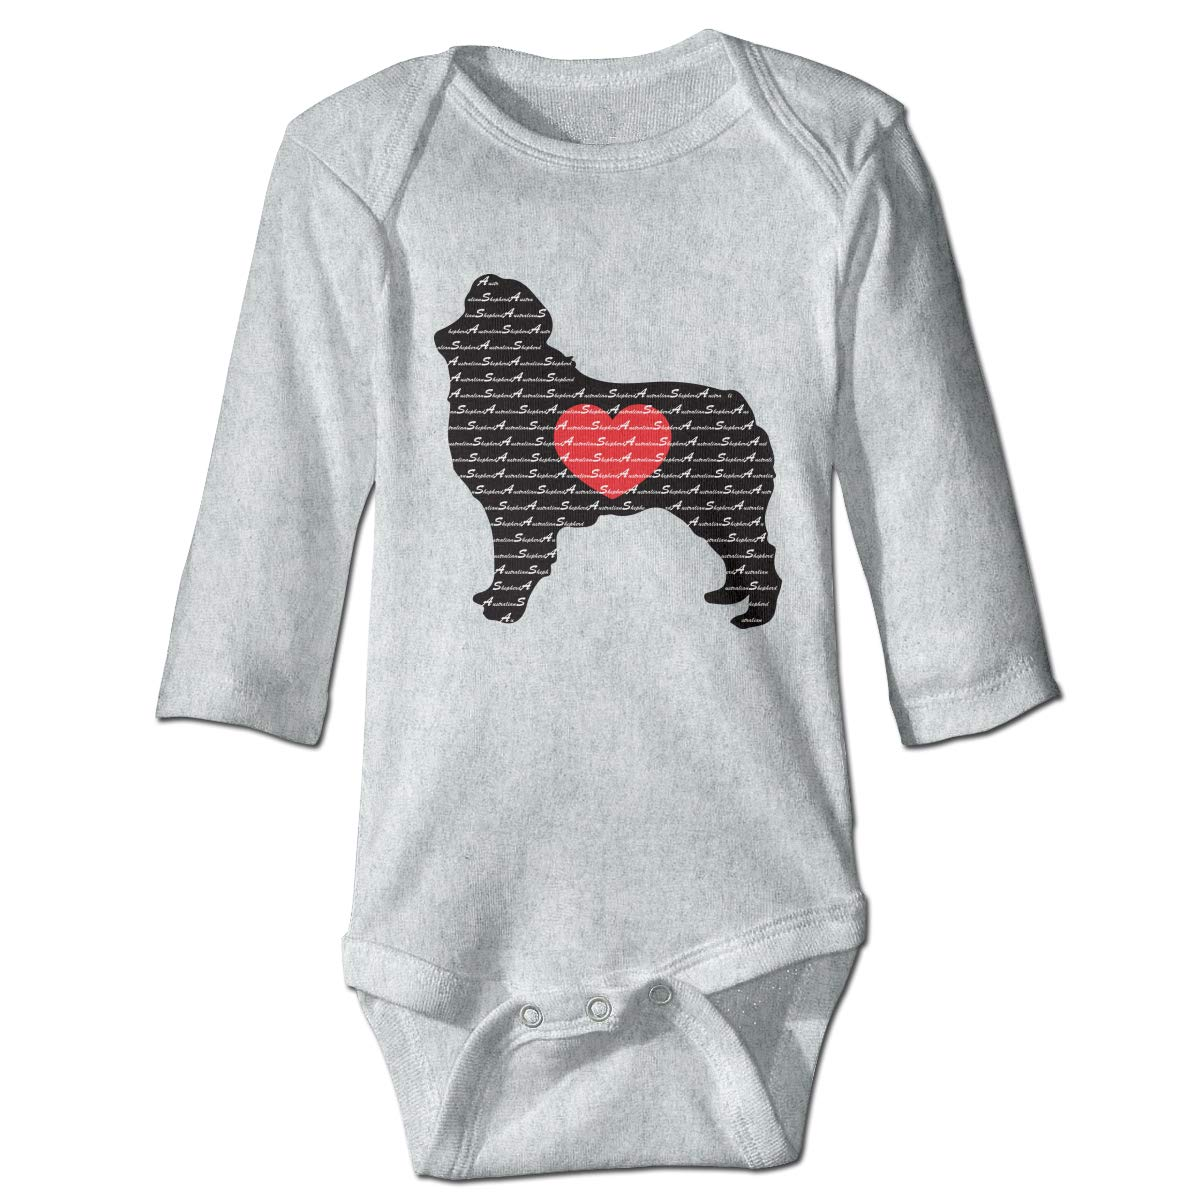 Infant Toddler Baby Australian Shepherd Silhouette with Heart Long Sleeve Infant Romper 0-24 Months